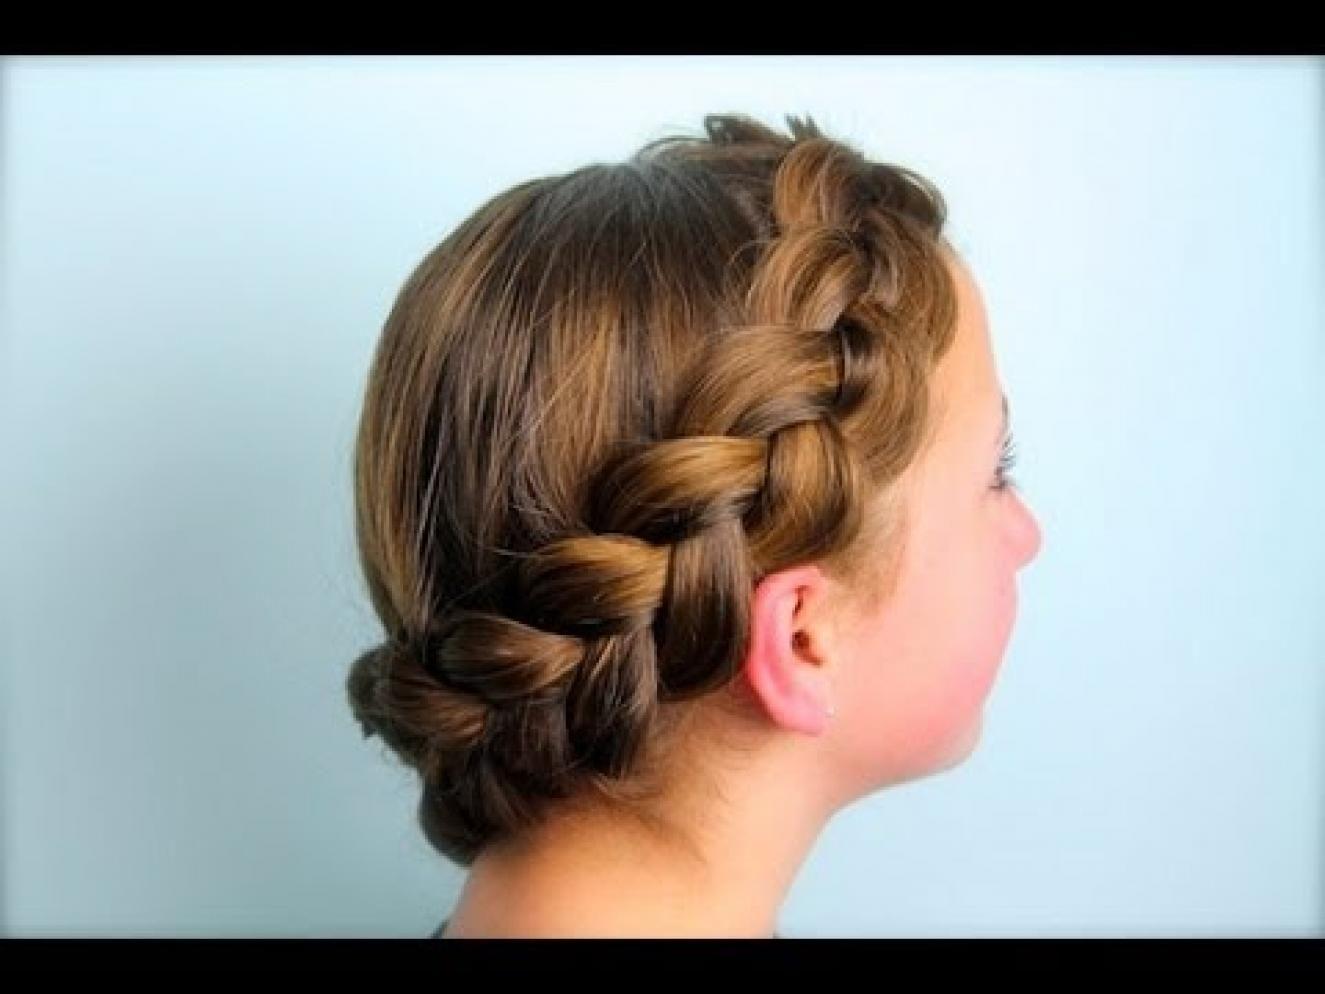 Unique Hair Styles: Wrap-Around Dutch Pancake Braid